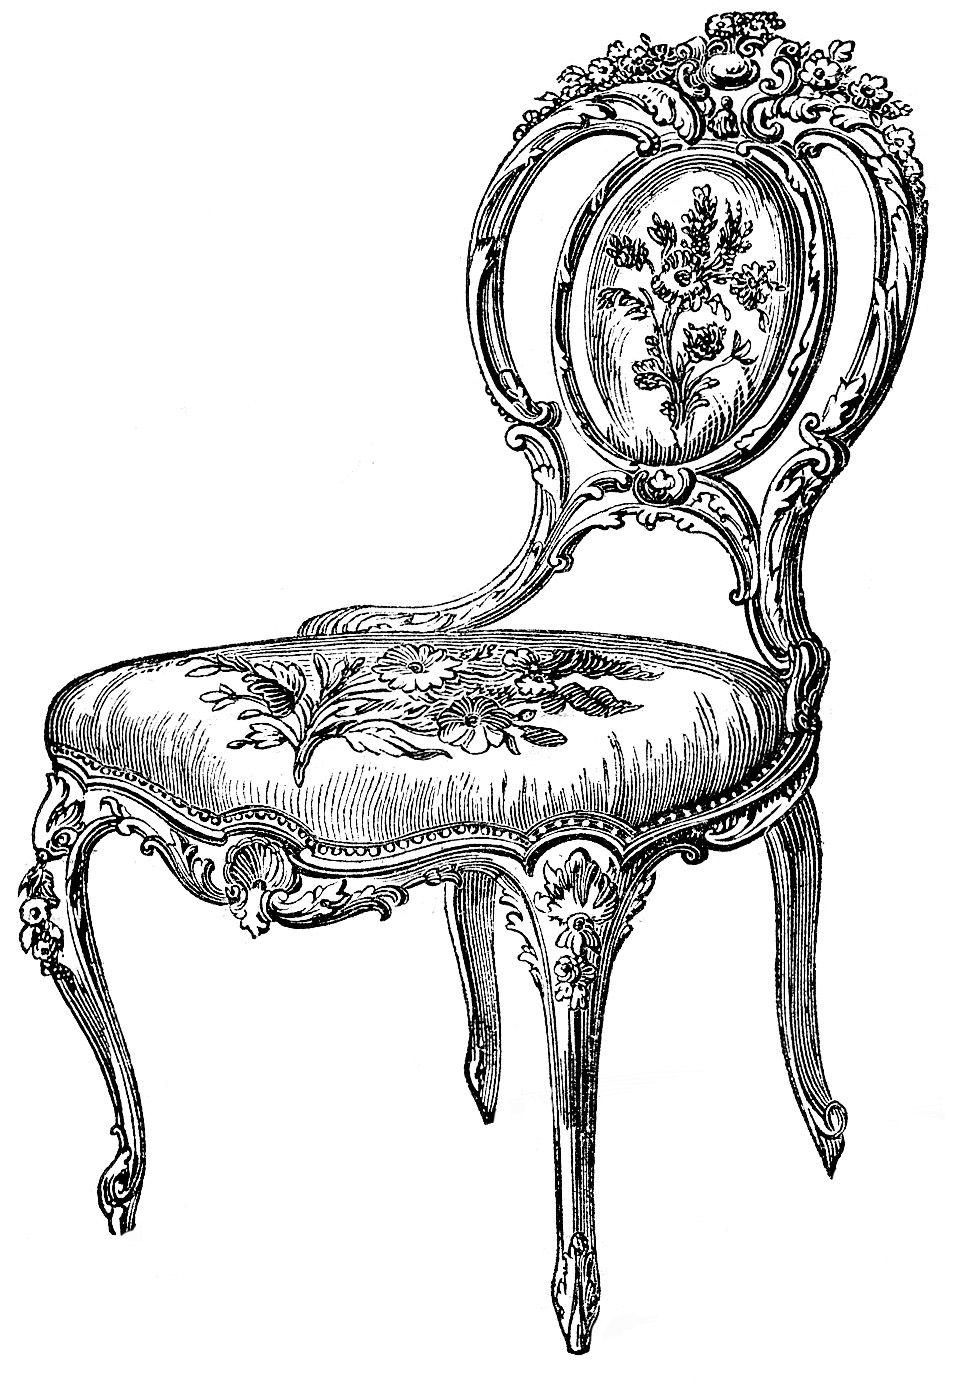 Chairs Frenchy Graphicsfairy003bwb Jpg Jpeg Image 966x1381 Pixels Clip Art Vintage Vintage Graphics Clip Art